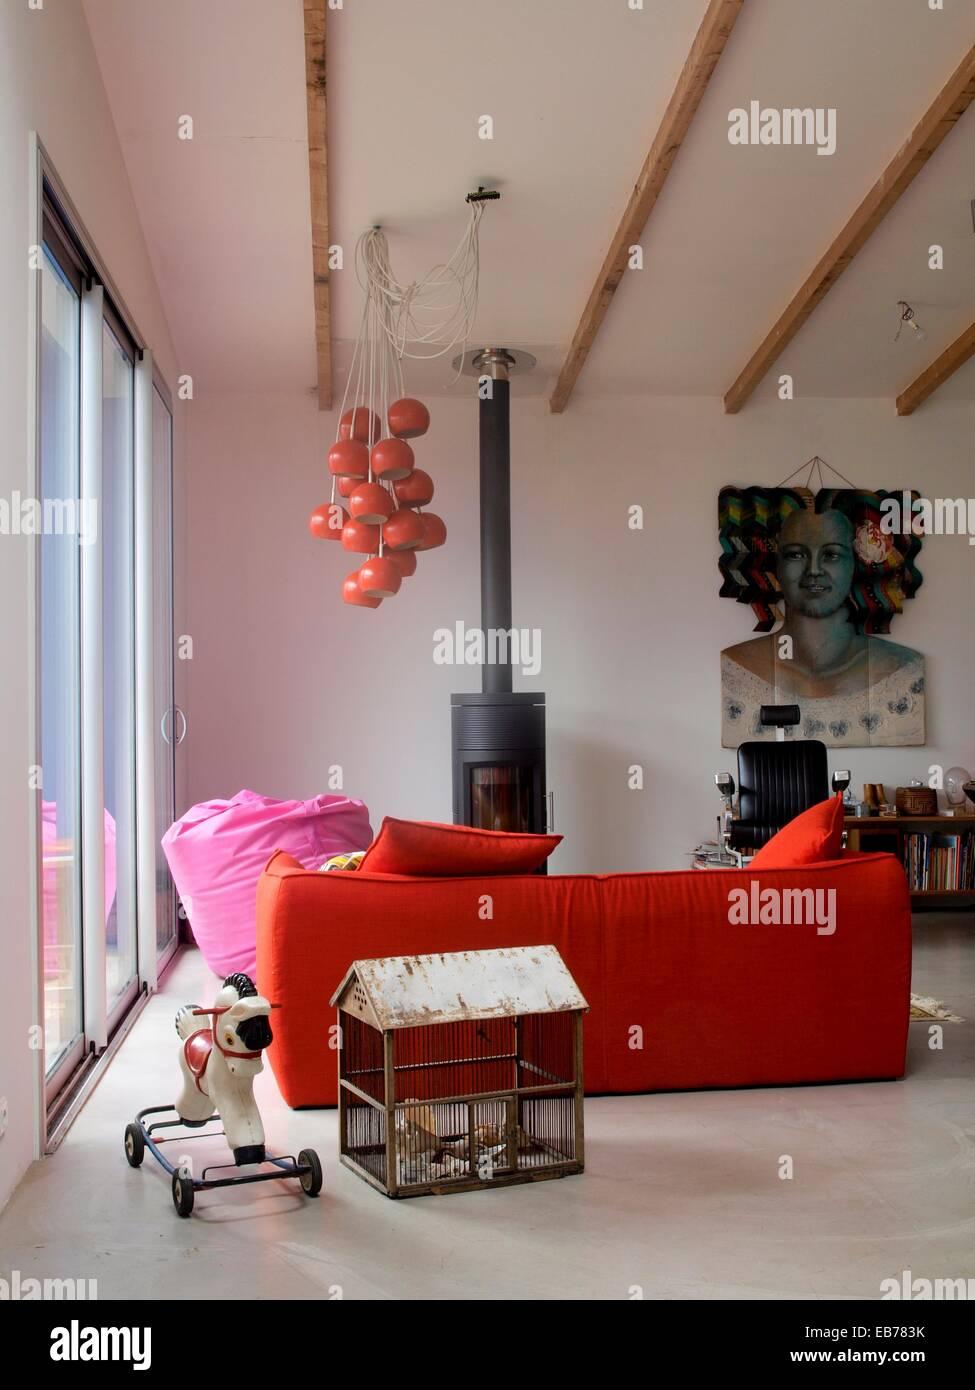 Lounge. Spielzeugpferd auf Rädern. Käfig-förmige Haus. Rotes Sofa ...